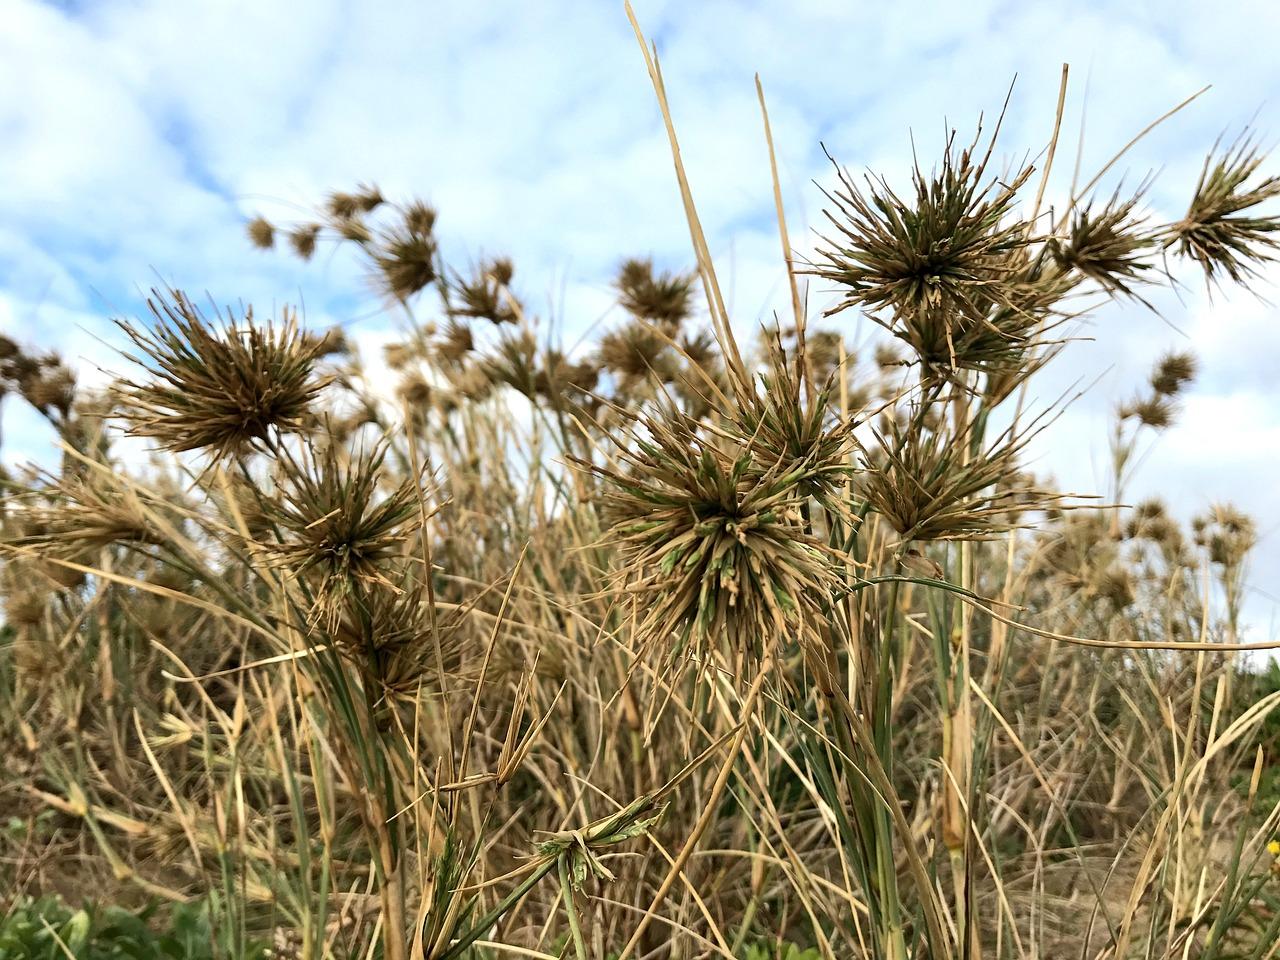 прибрежная трава картинки дела идут жилу